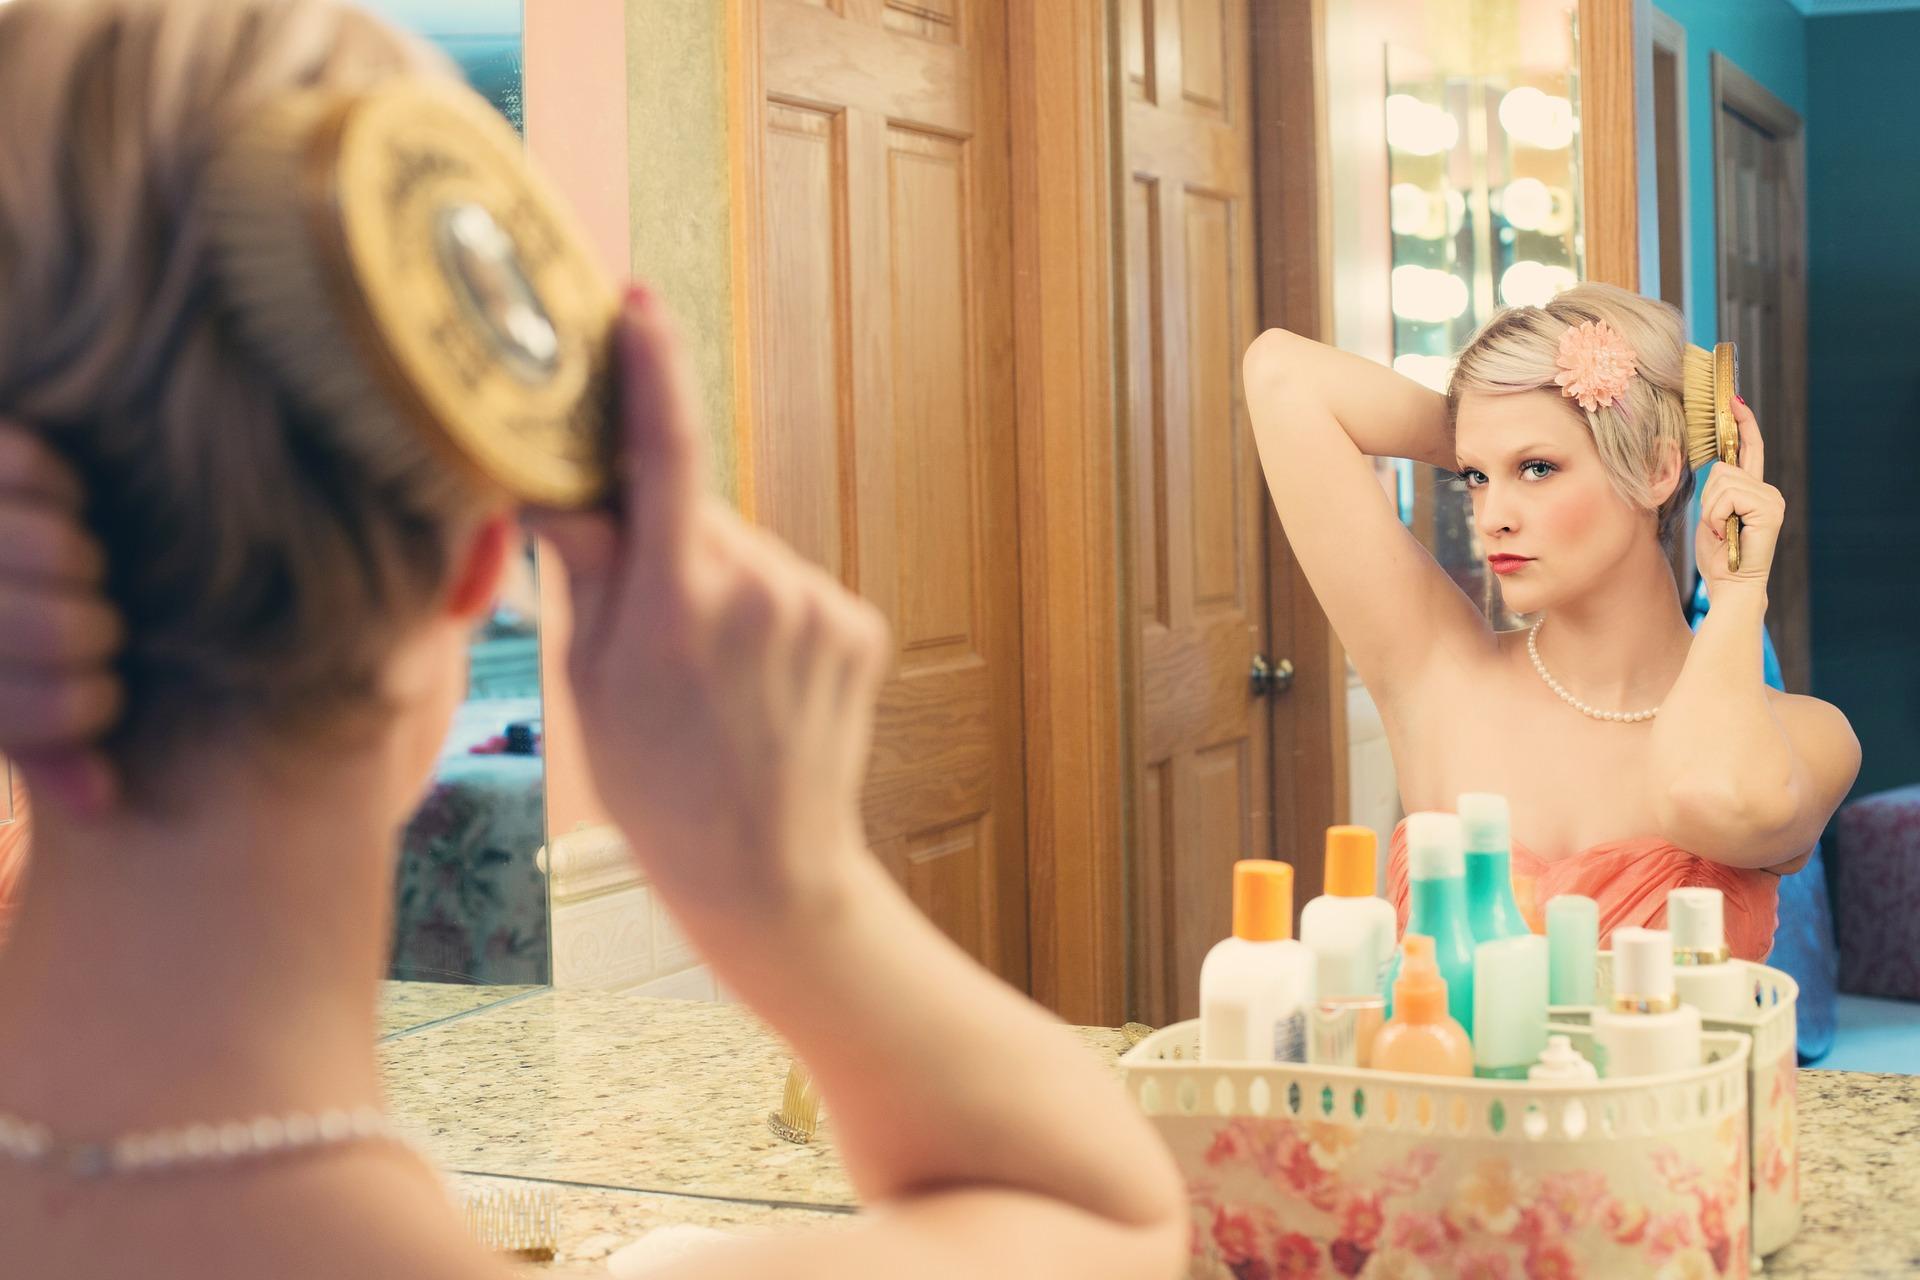 Beautiful woman with amazing makeup